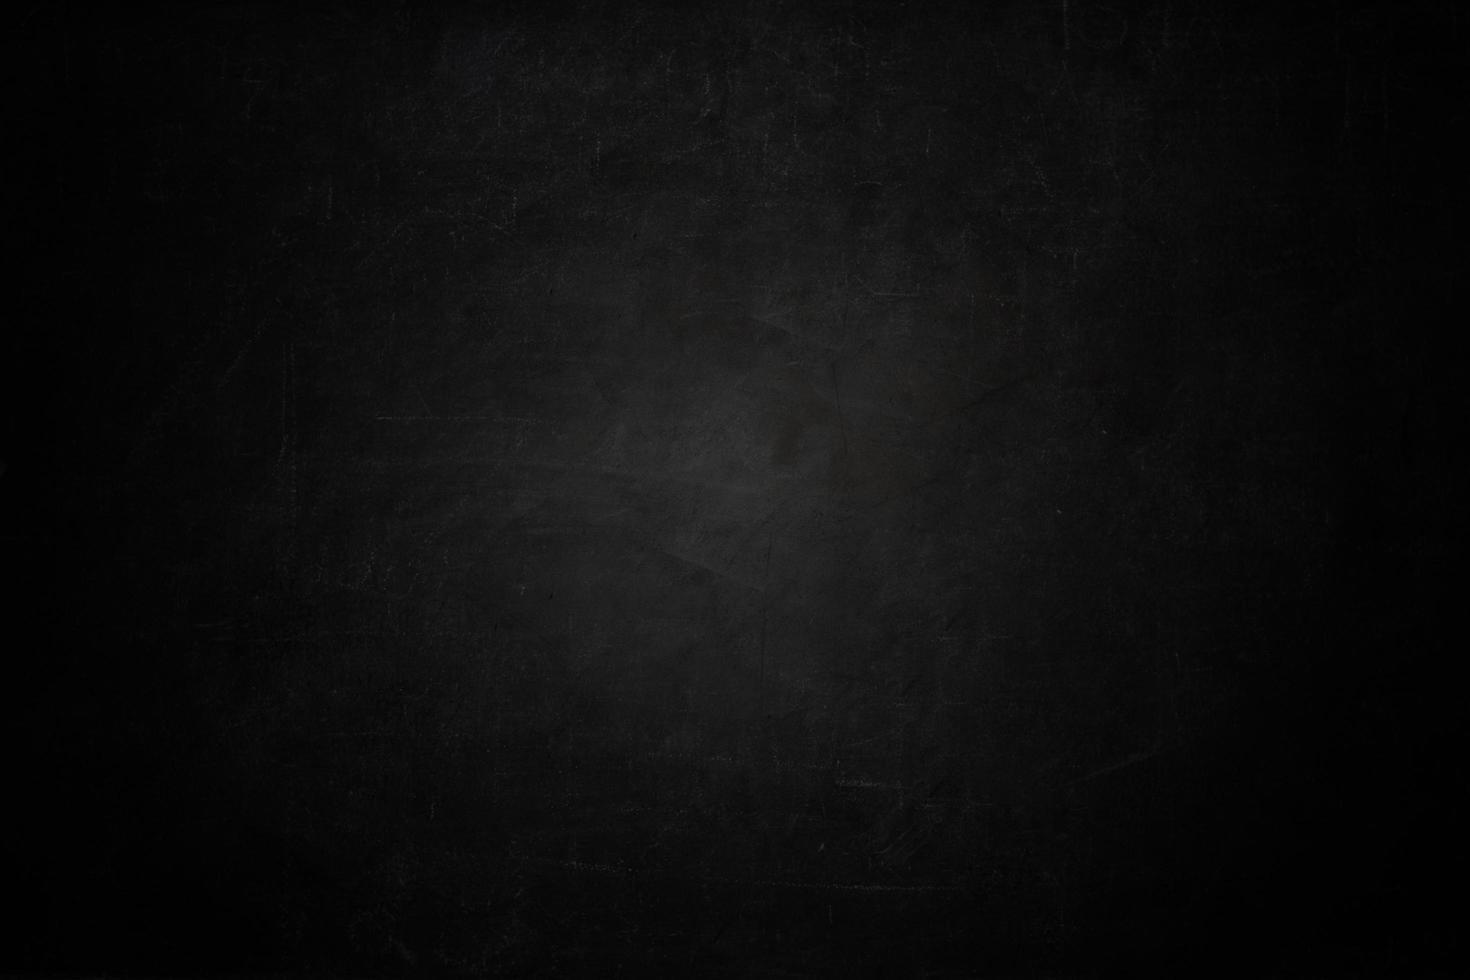 dunkle Tafeloberfläche foto